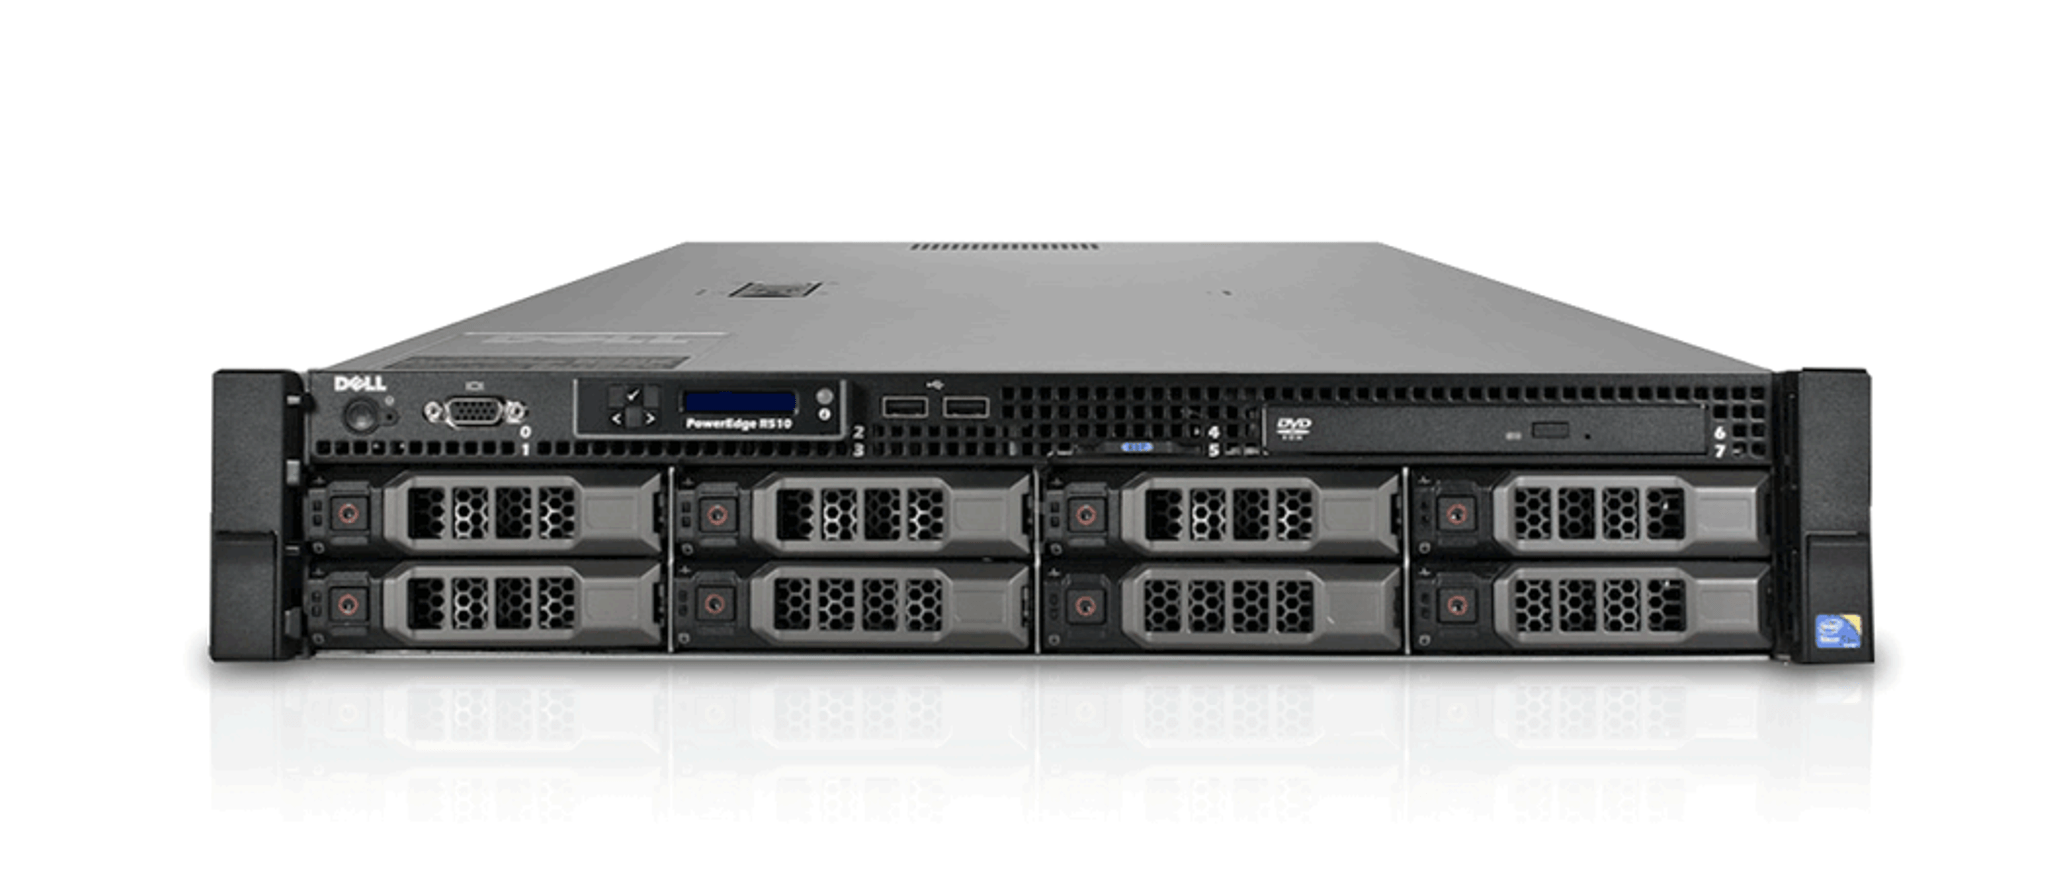 Dell PowerEdge R510 Server - 3 5